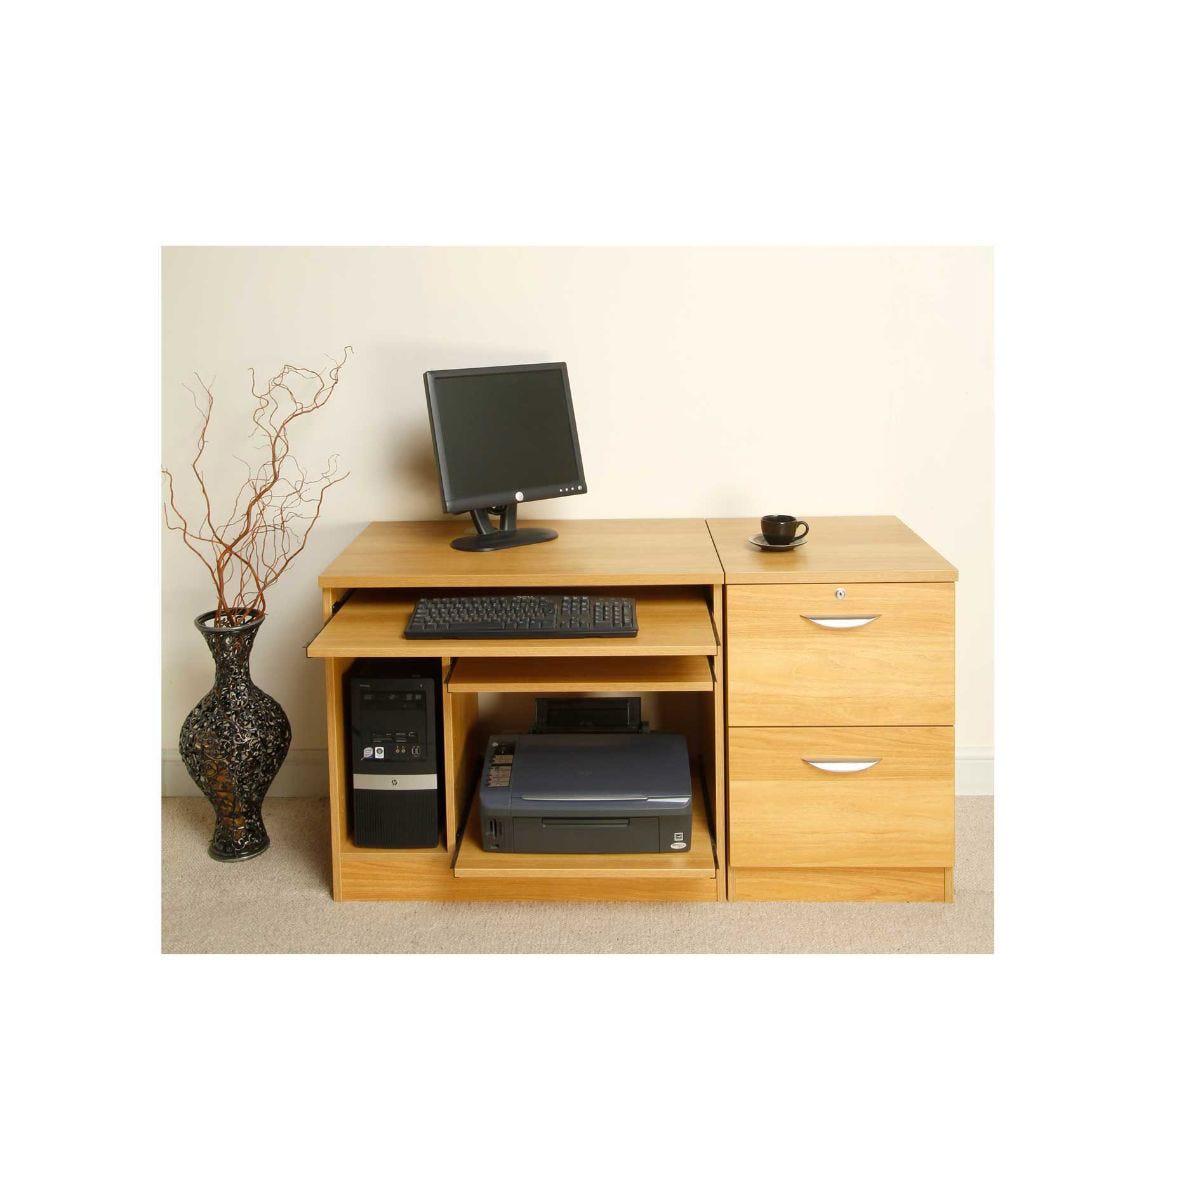 R White Lawrence Desk Workstation, White